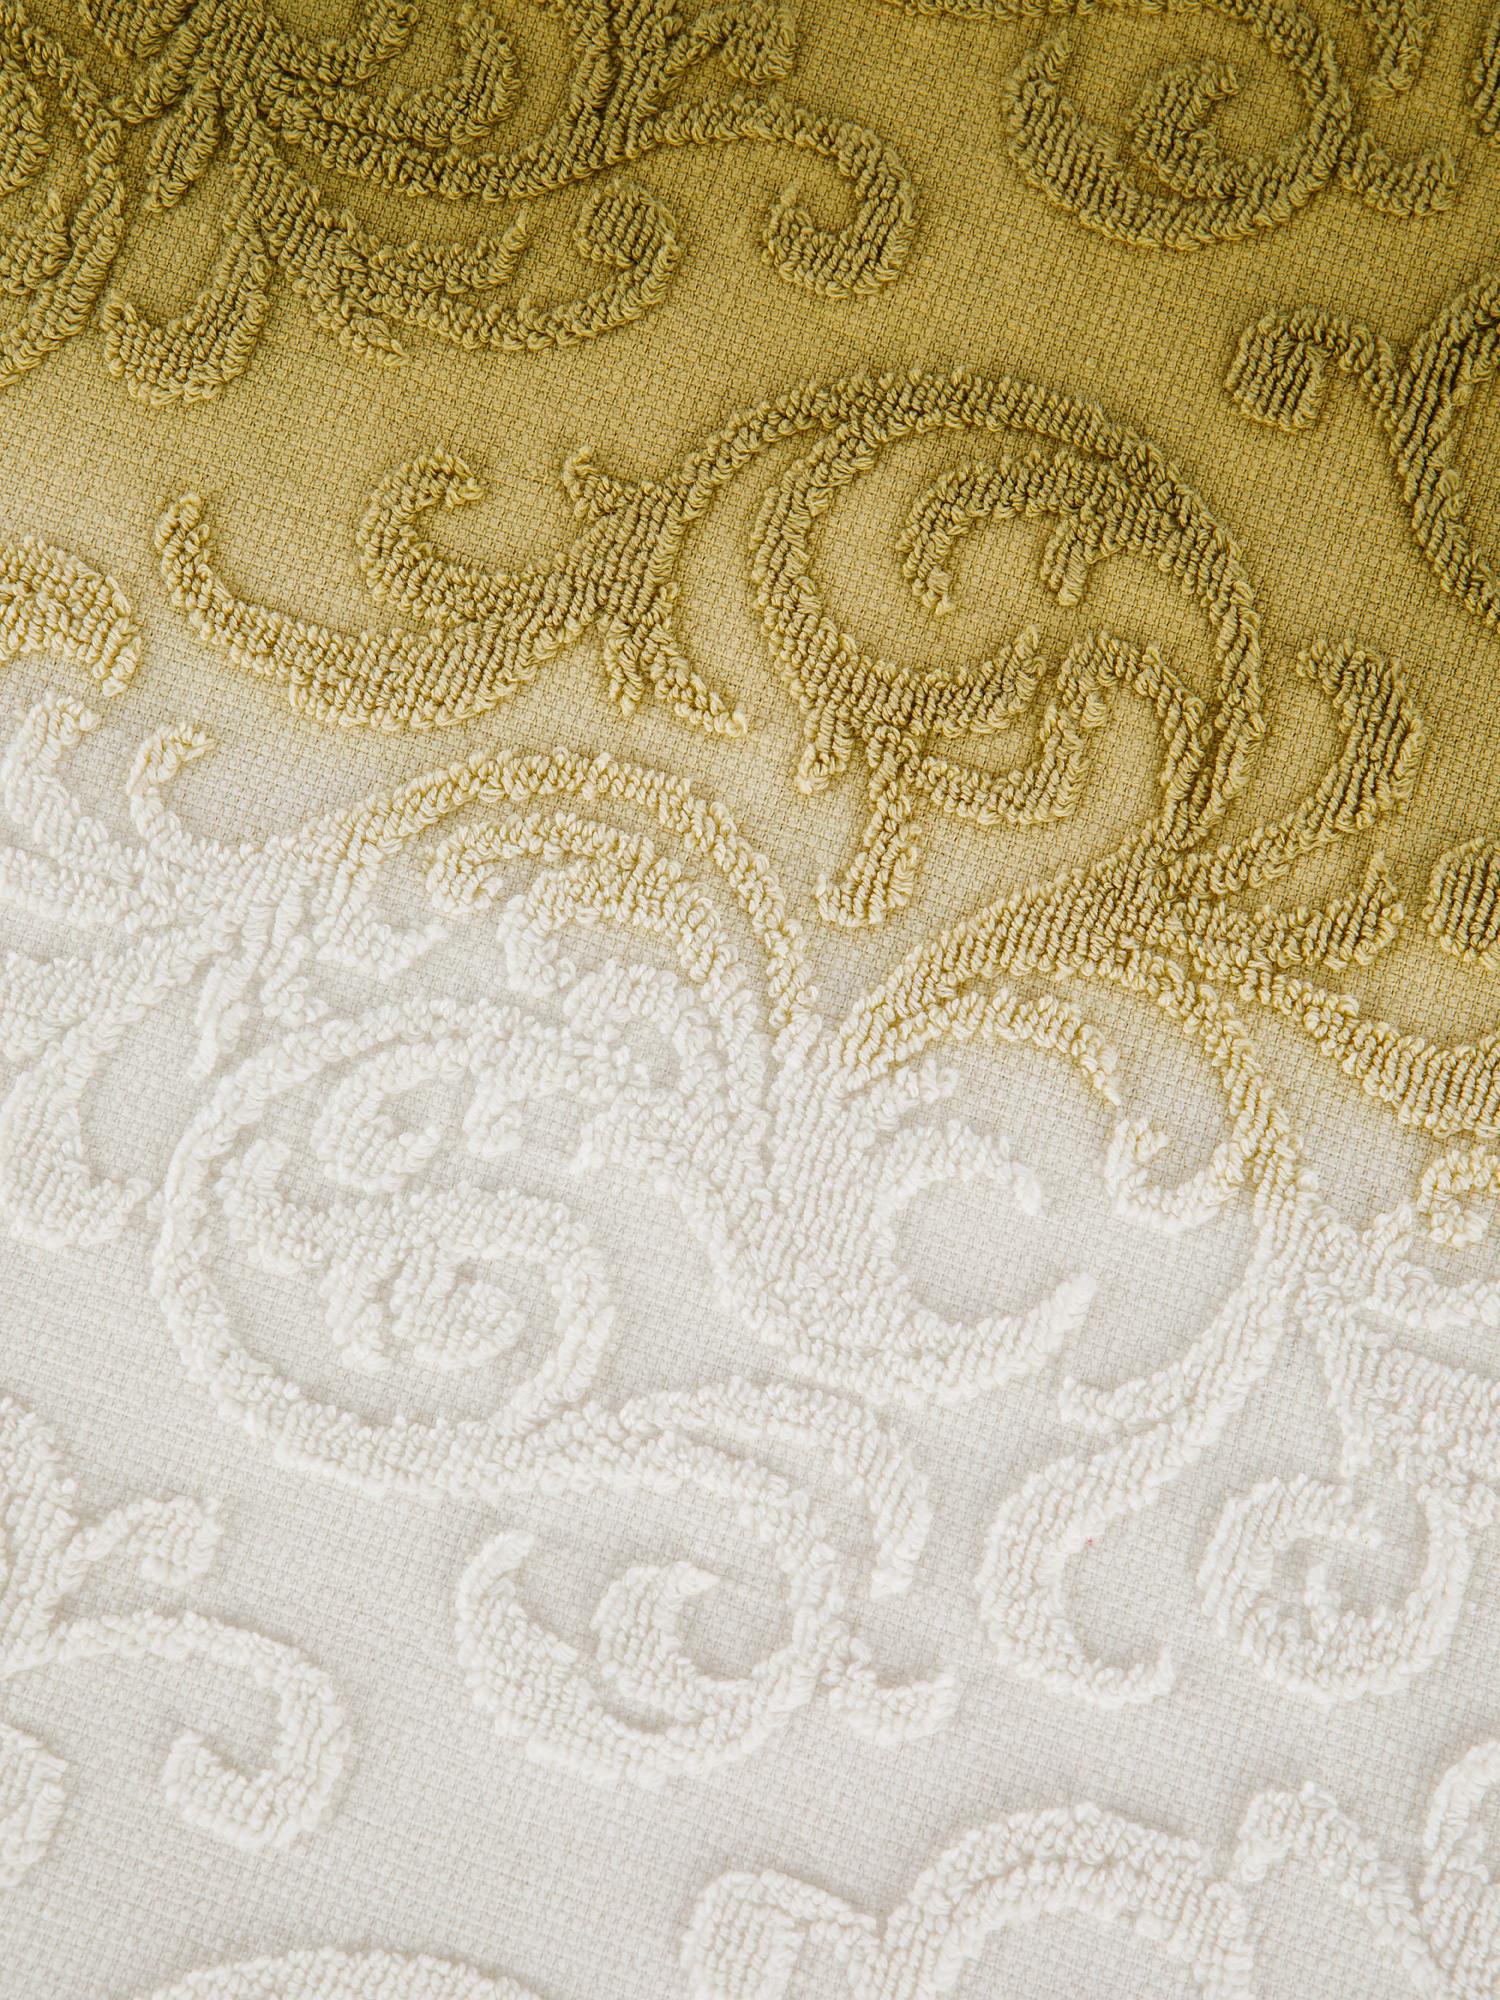 Asciugamano spugna di cotone dip dye, Verde, large image number 3